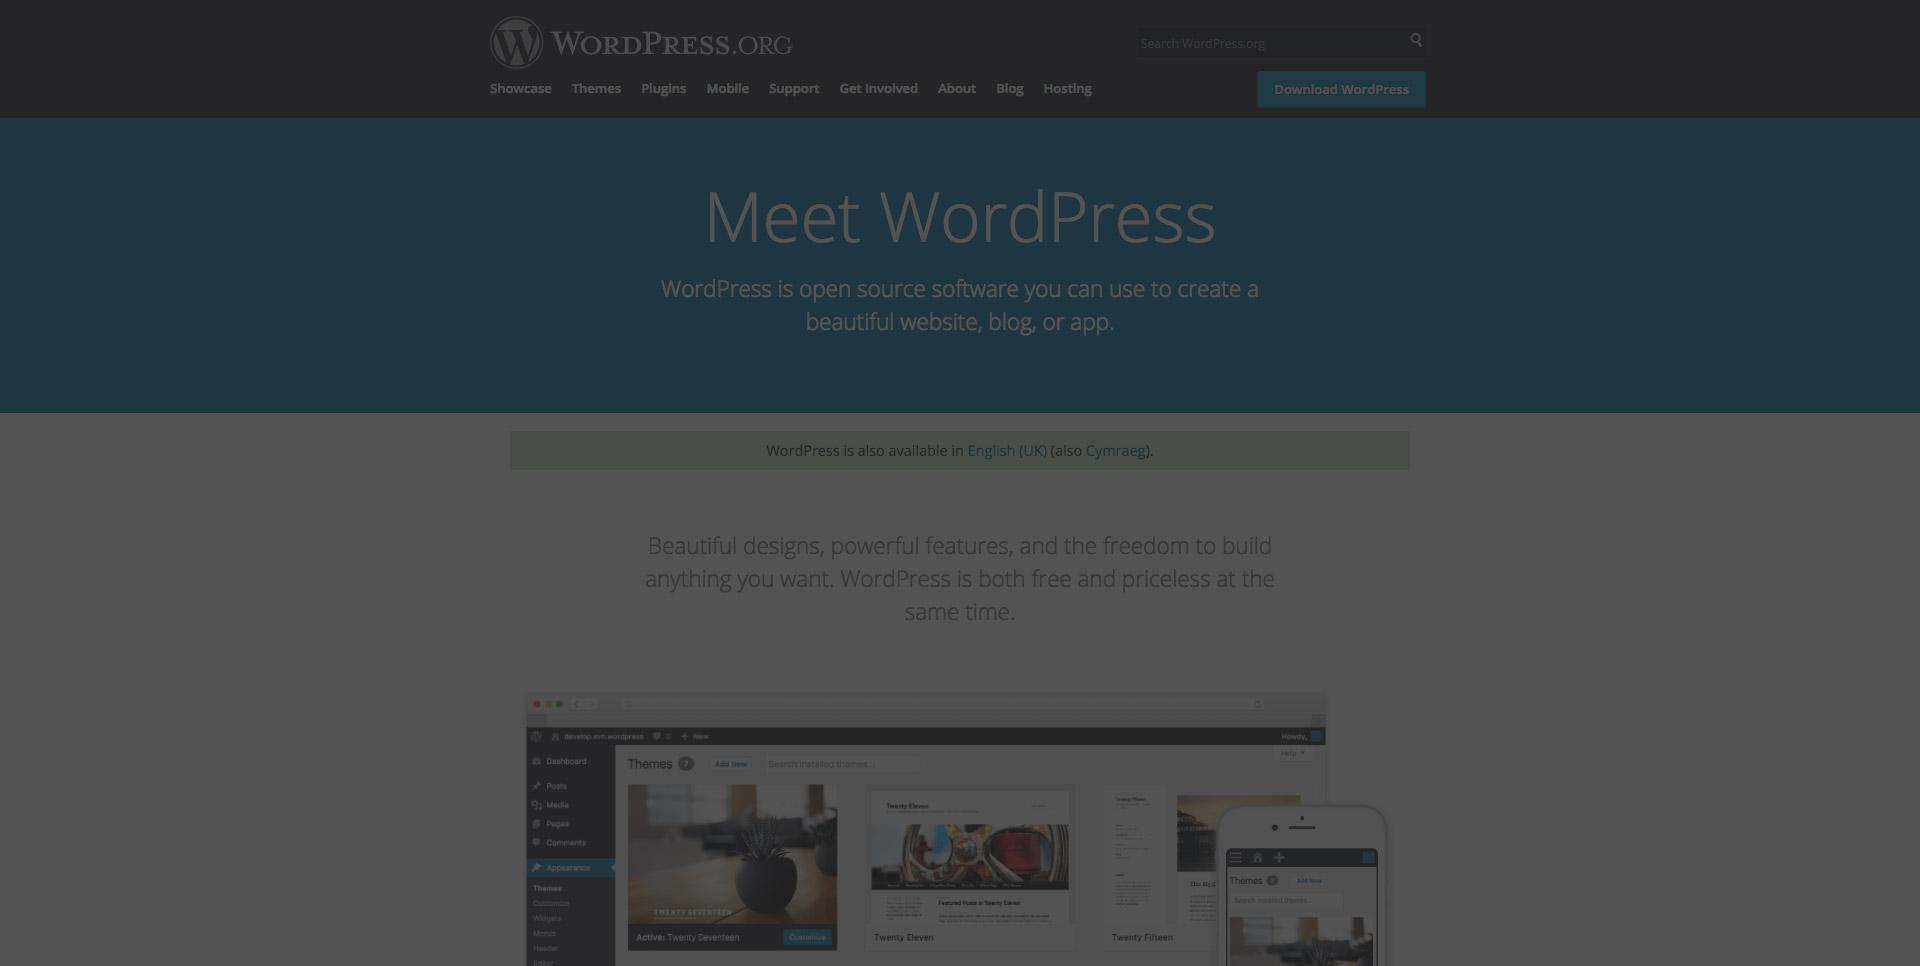 Why WordPress is the best website platform for SME's